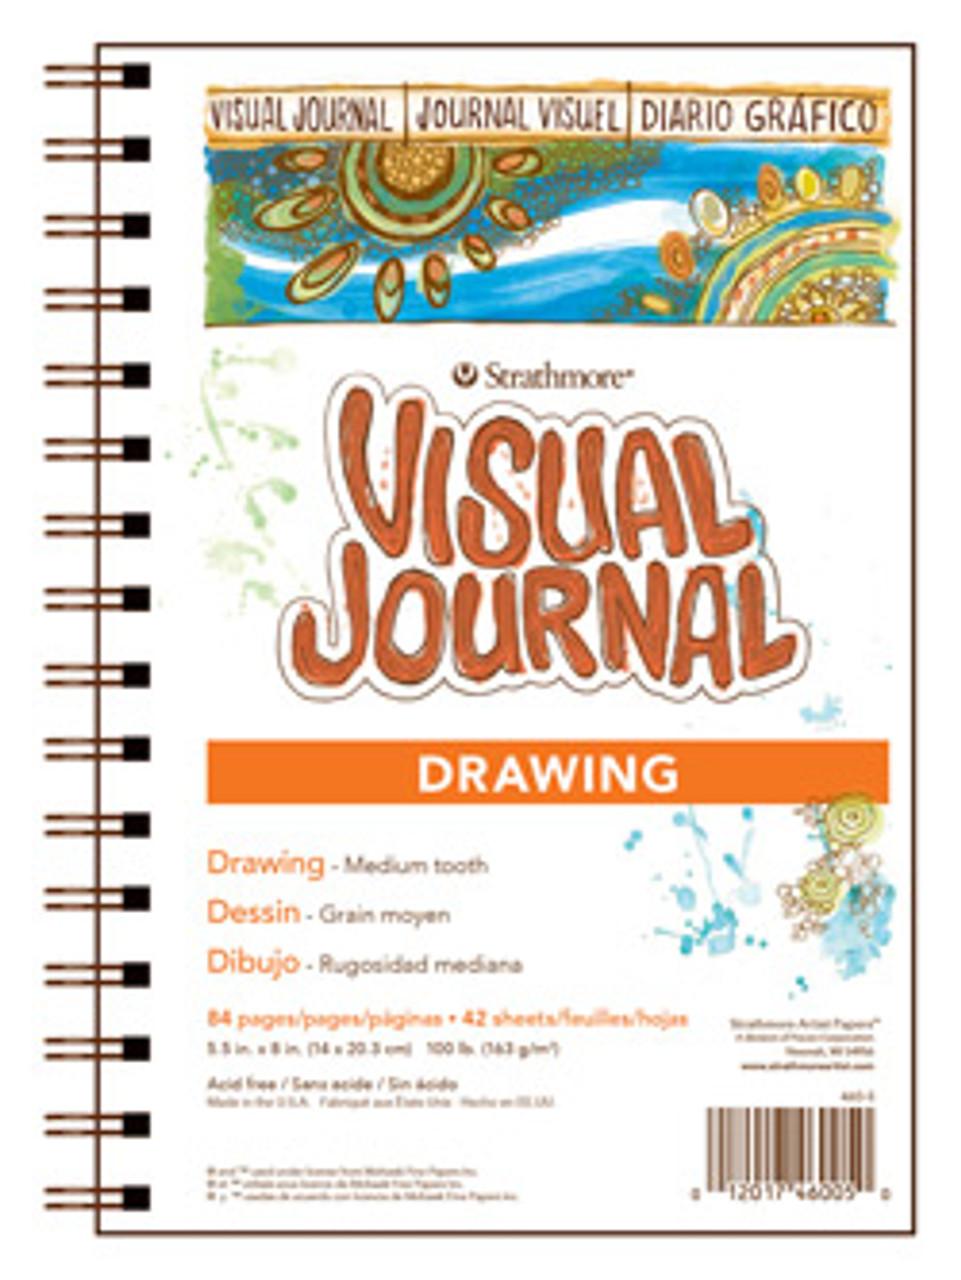 Visual Journal Drawing 9 x 12